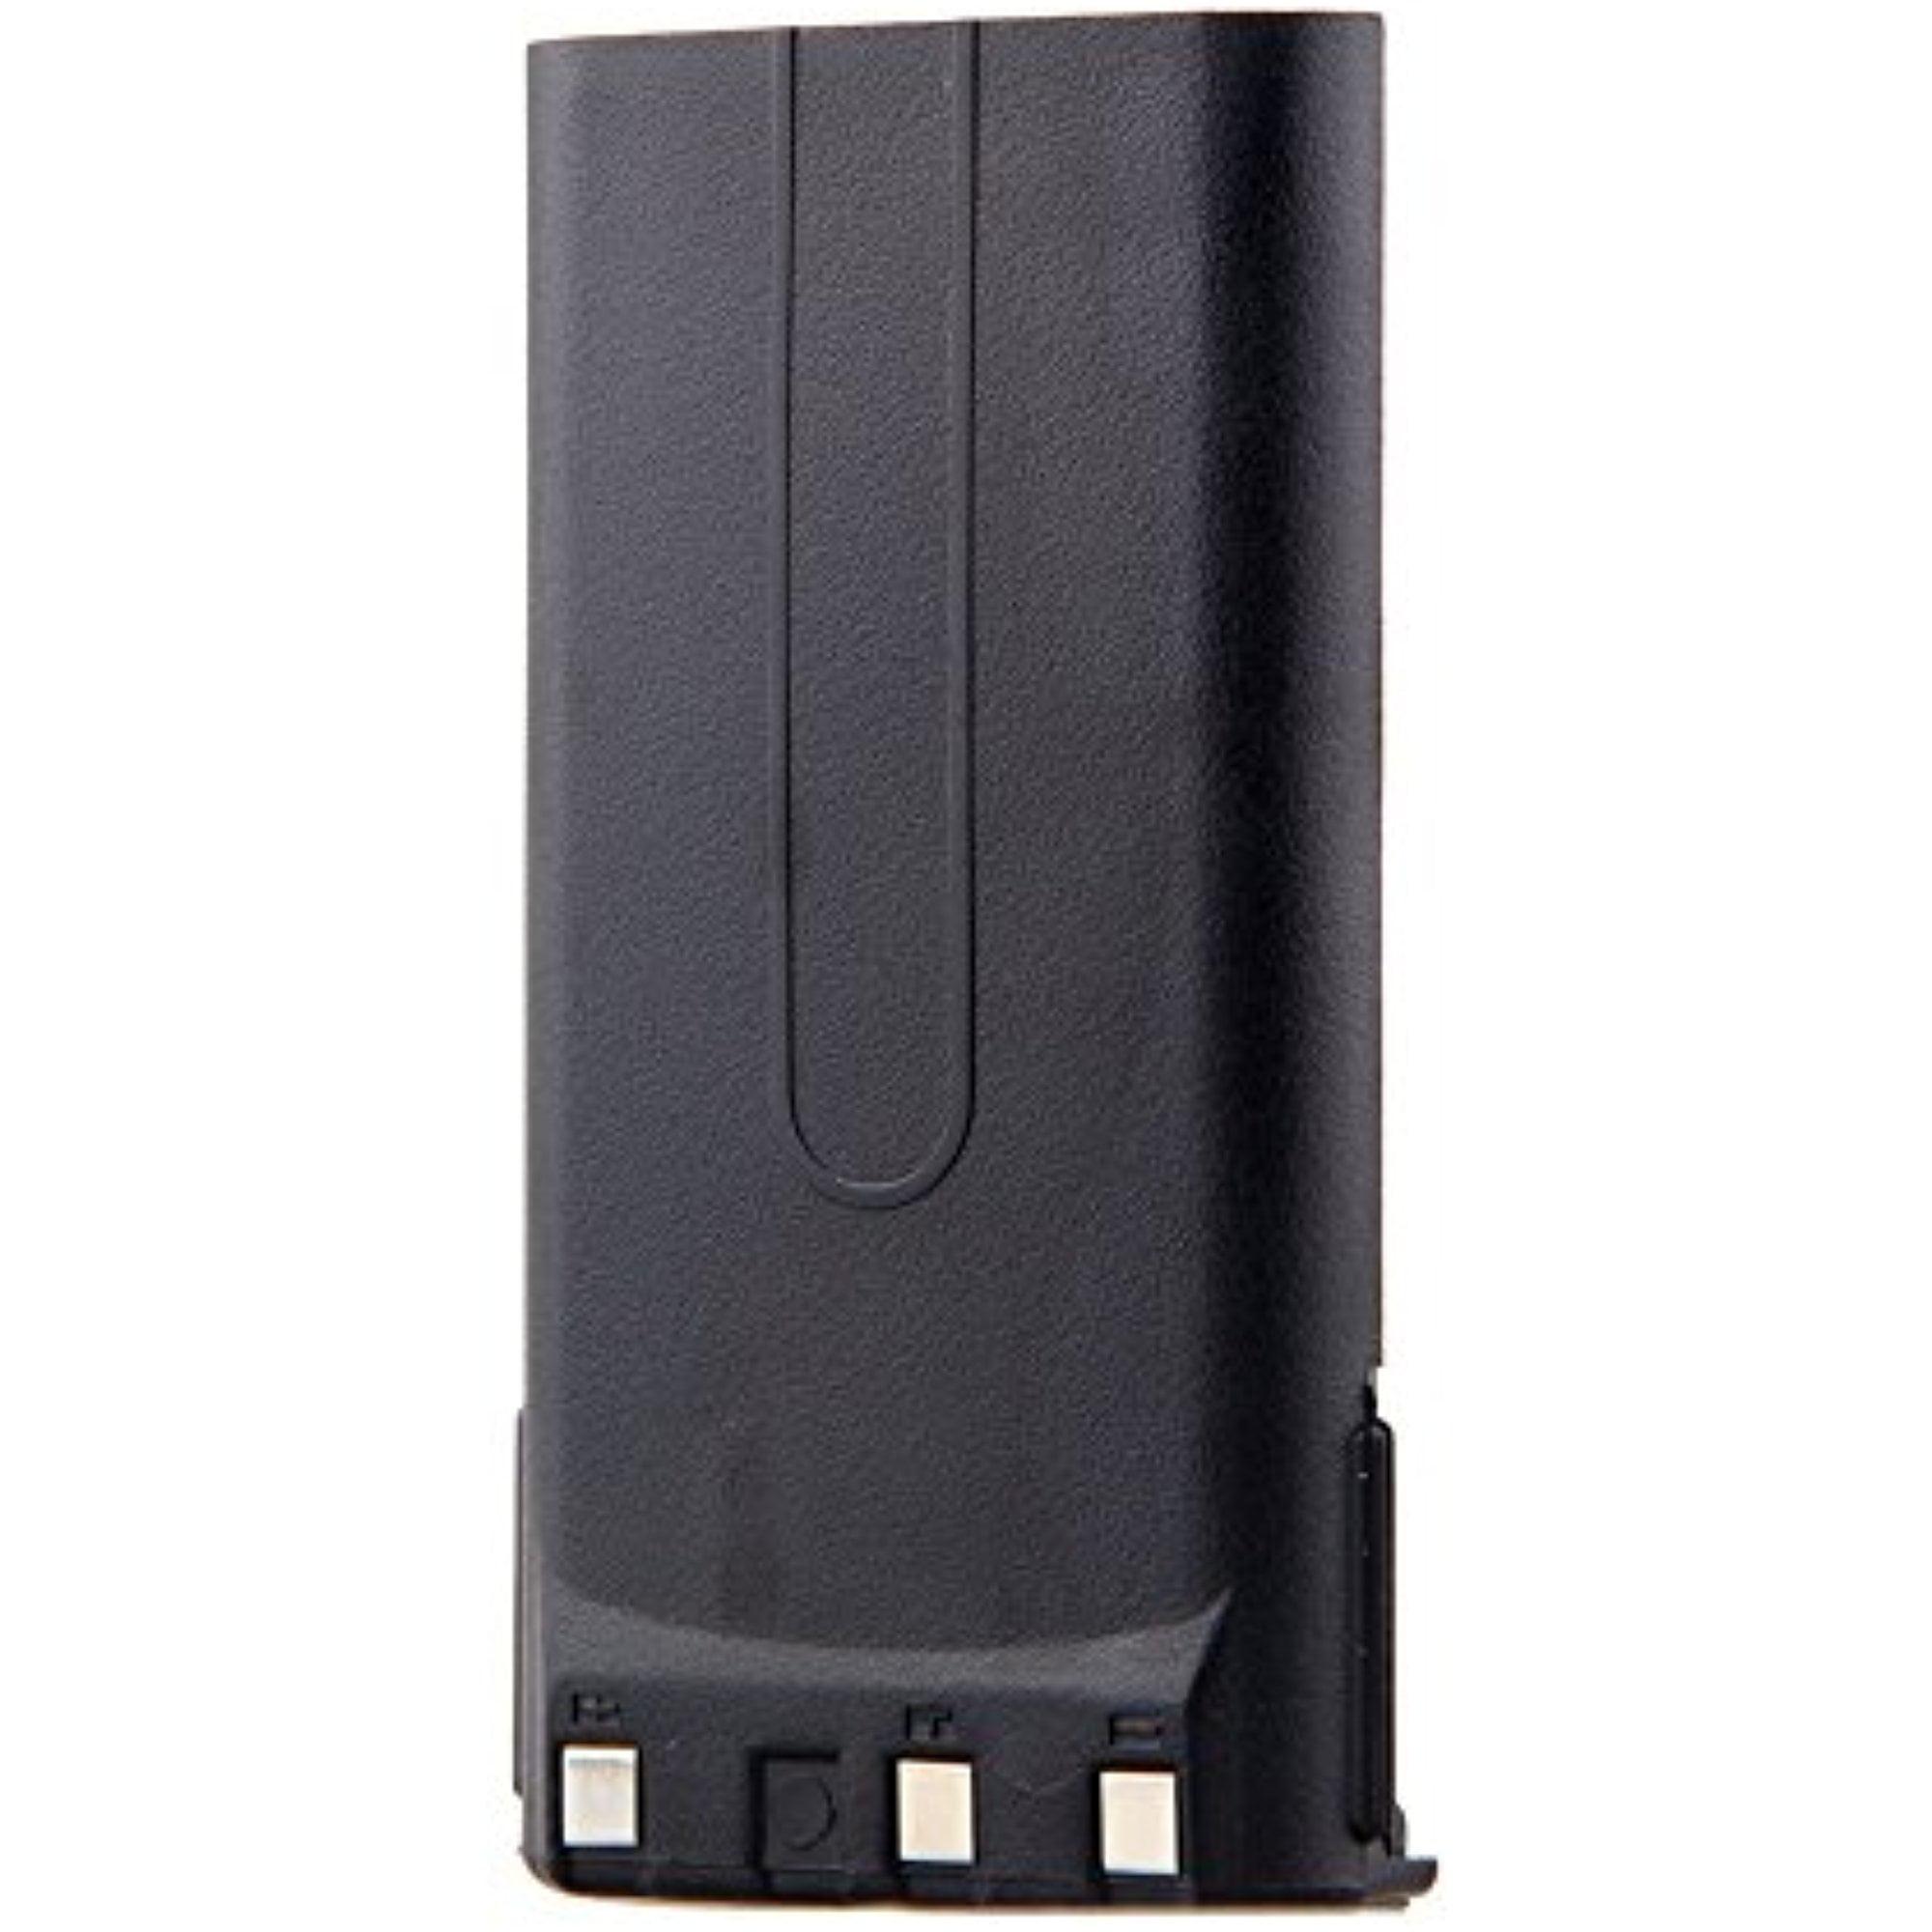 Two-Way Radio Battery for Kenwood KNB-15A TK-3107 TK-388G TK-260 TK-3100 TK-372